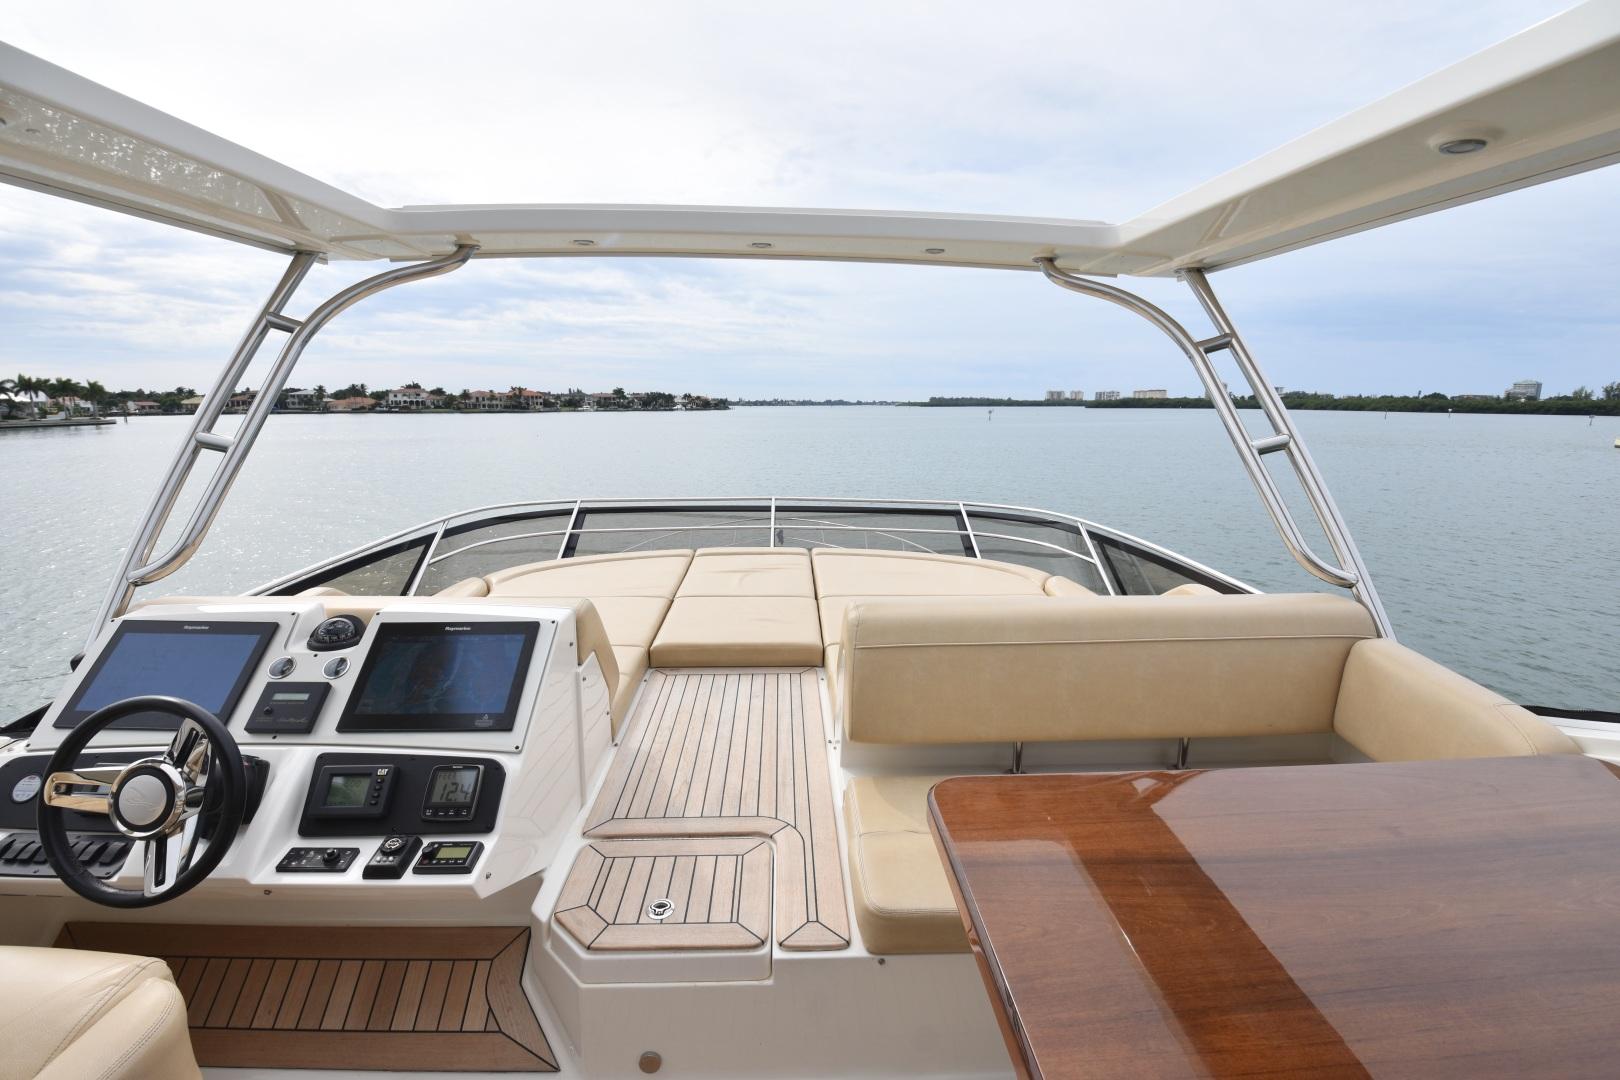 Sea Ray-L650 2016-3x's the Charm Longboat Key-Florida-United States-2016 Sea Ray L650  3x's the Charm  Flybridge-1251856 | Thumbnail